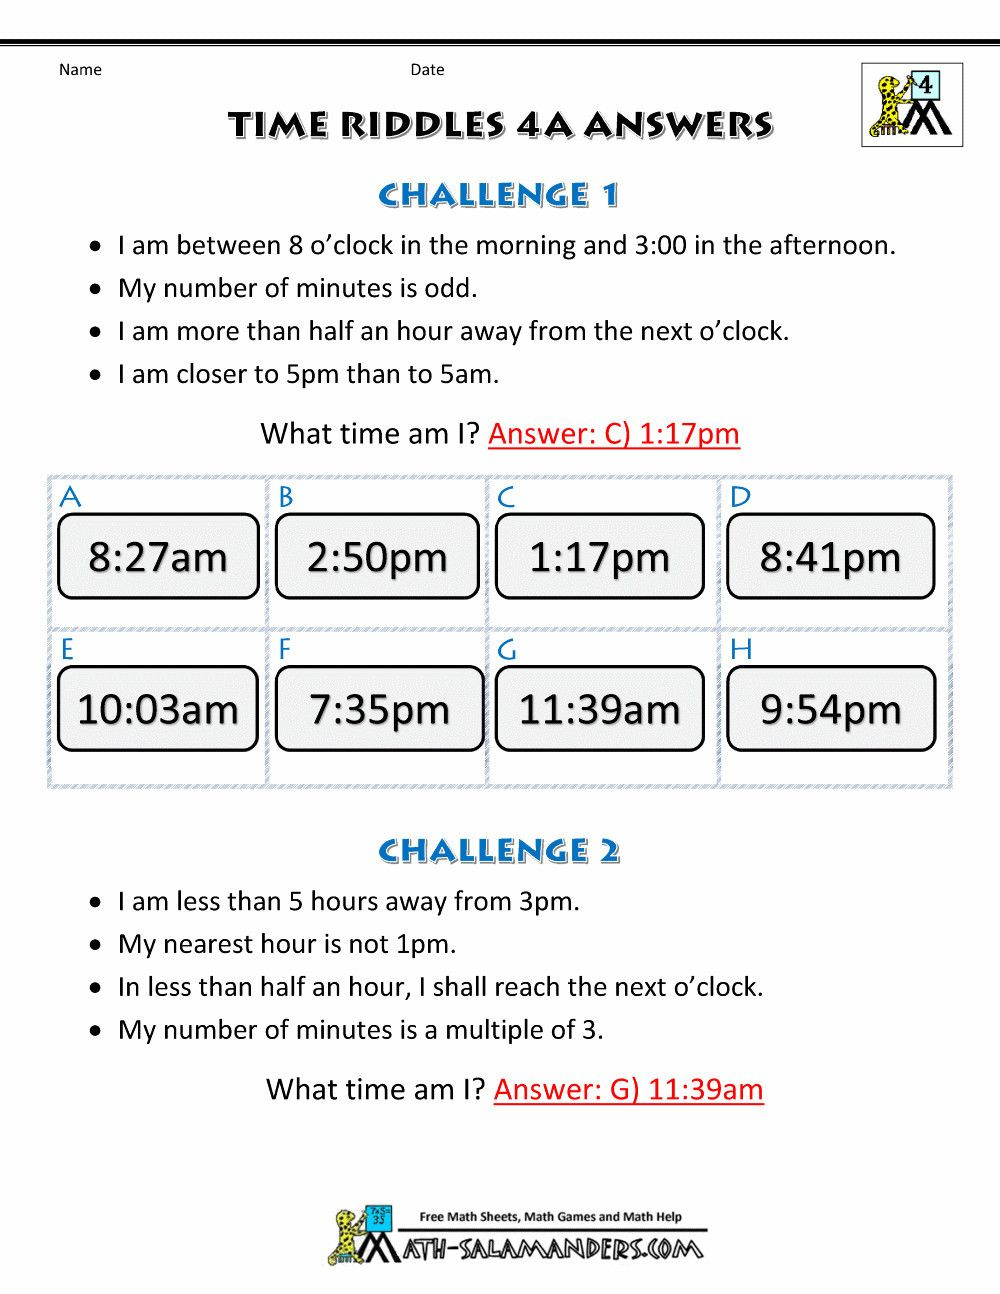 Elapsed Time 3rd Grade Worksheets 5 Free Math Worksheets Third Grade 3  Telling Time Elapsed   Time worksheets [ 1294 x 1000 Pixel ]